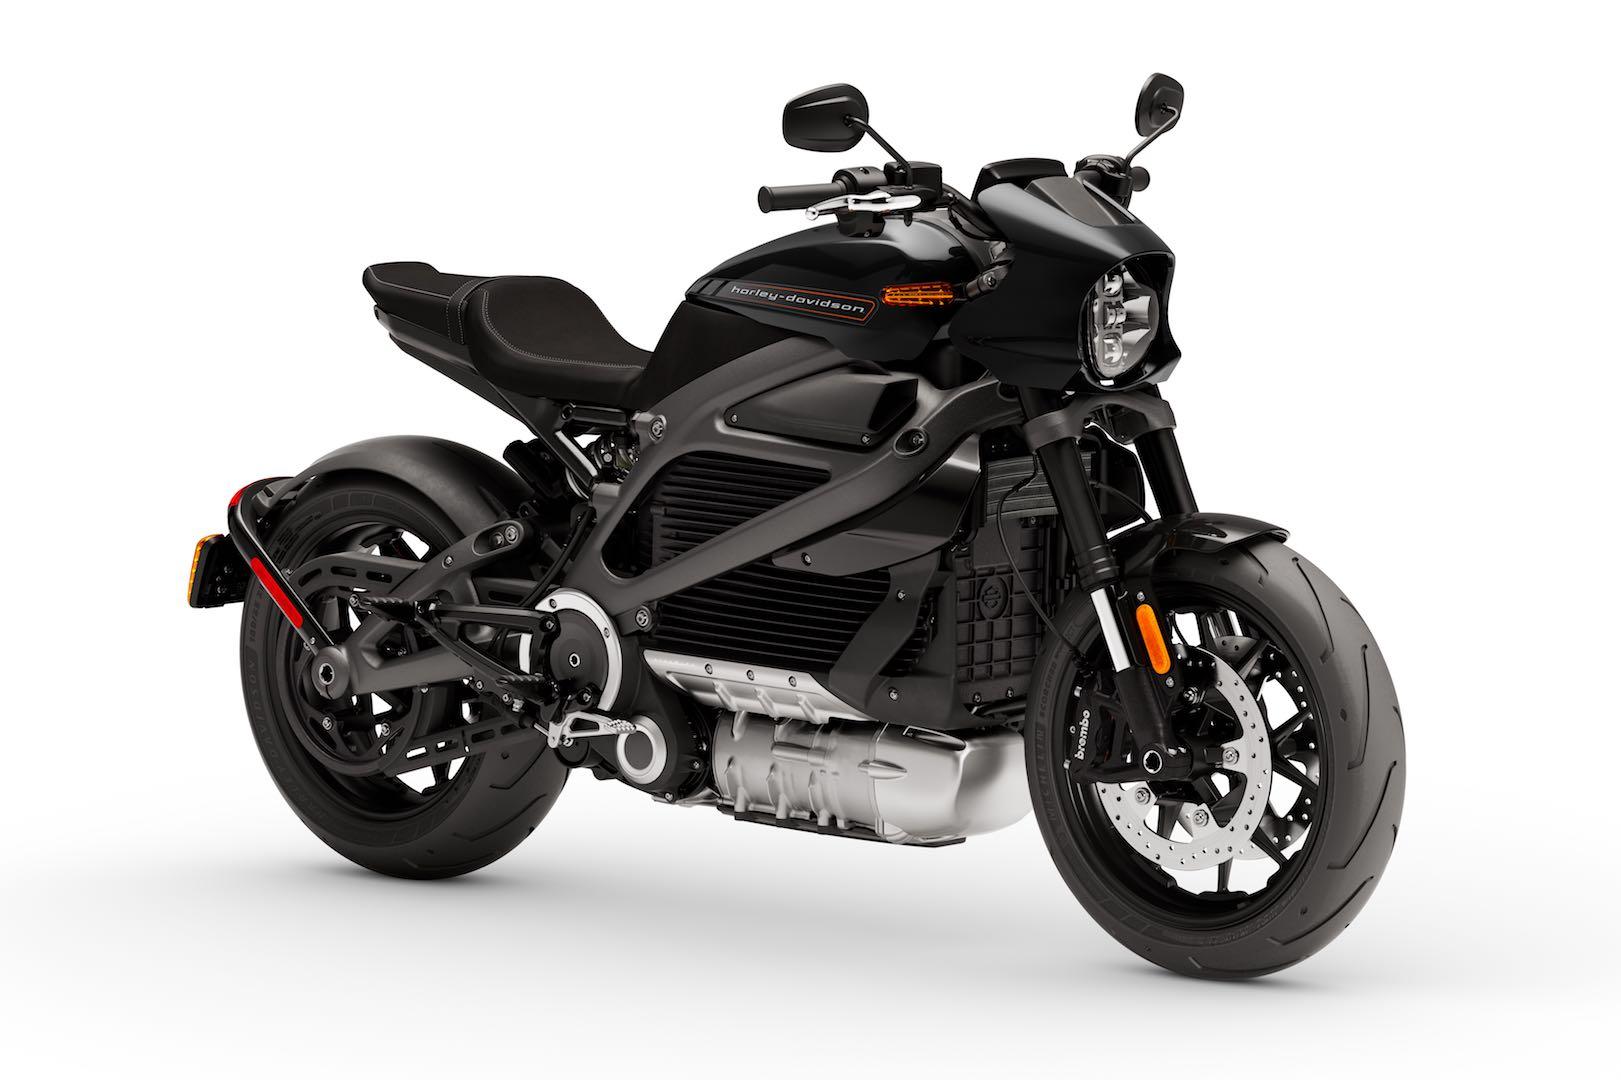 2020 Harley-Davidson LiveWire price